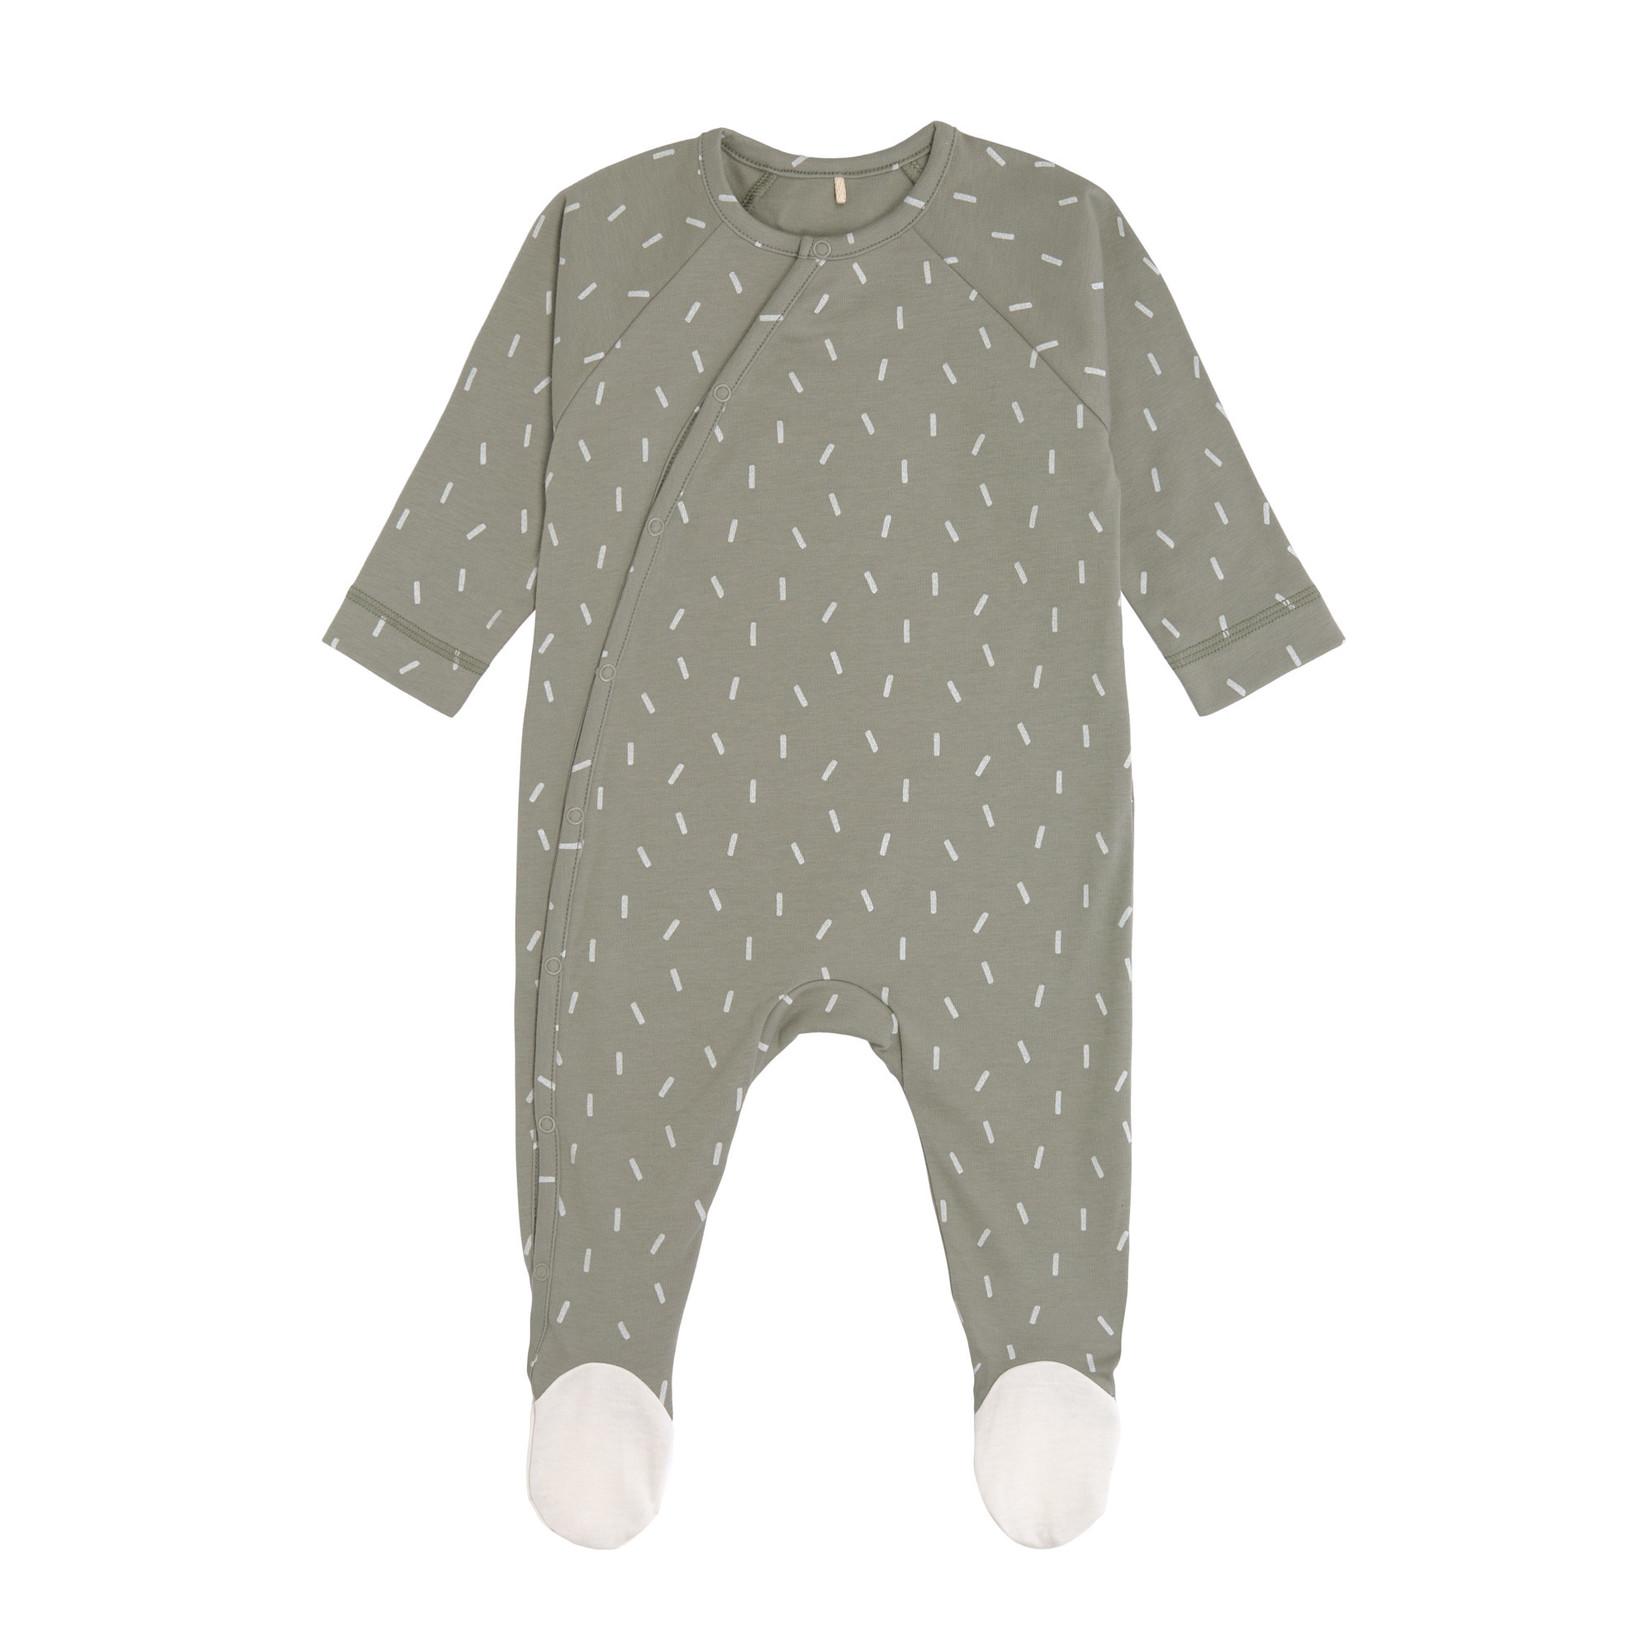 Lässig Pyjama with feet  Gots  Speckles Olive